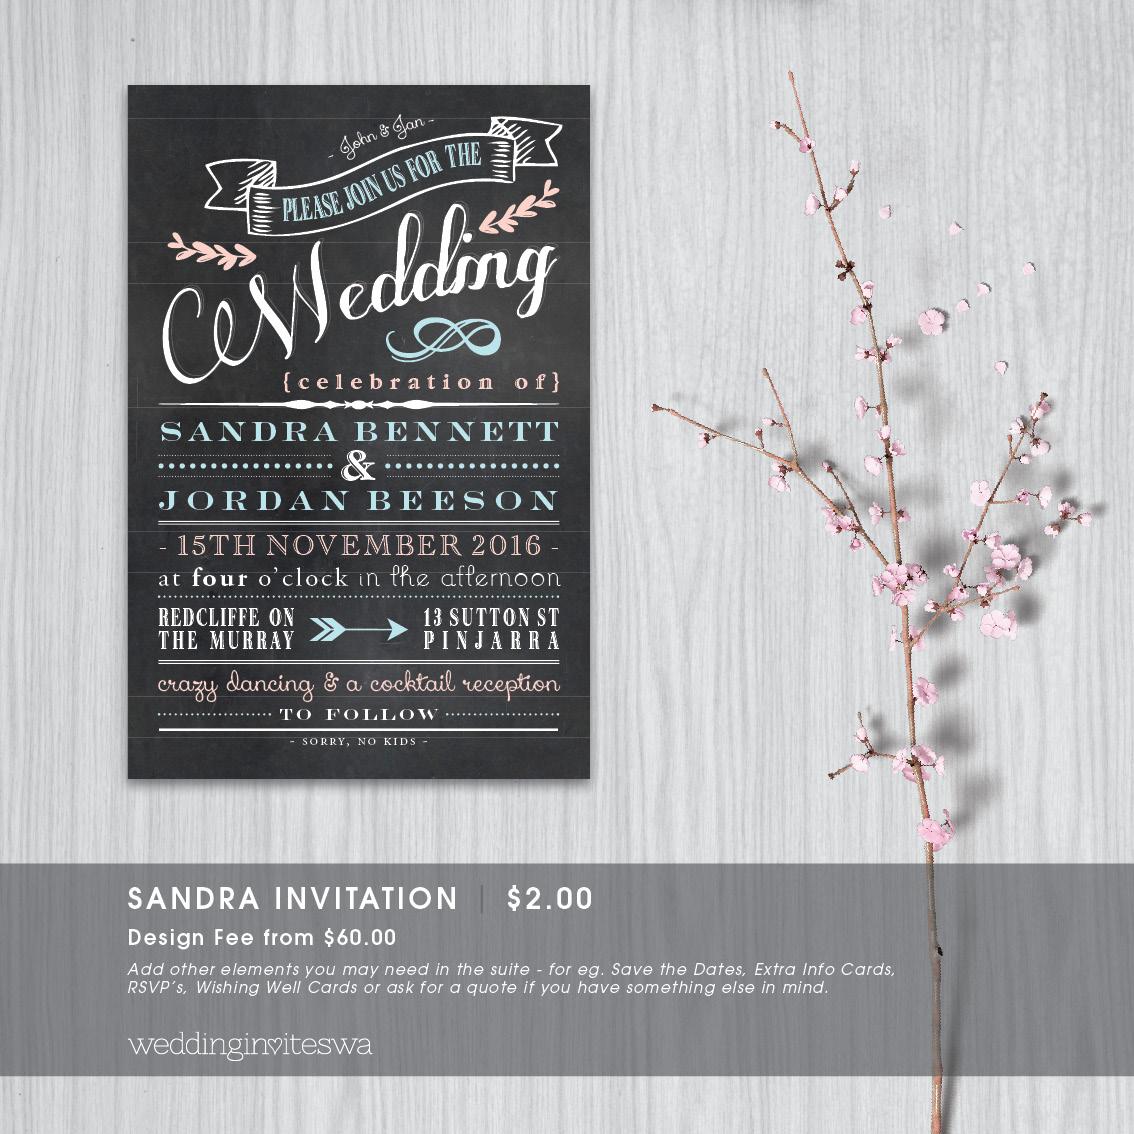 SANDRA_invite